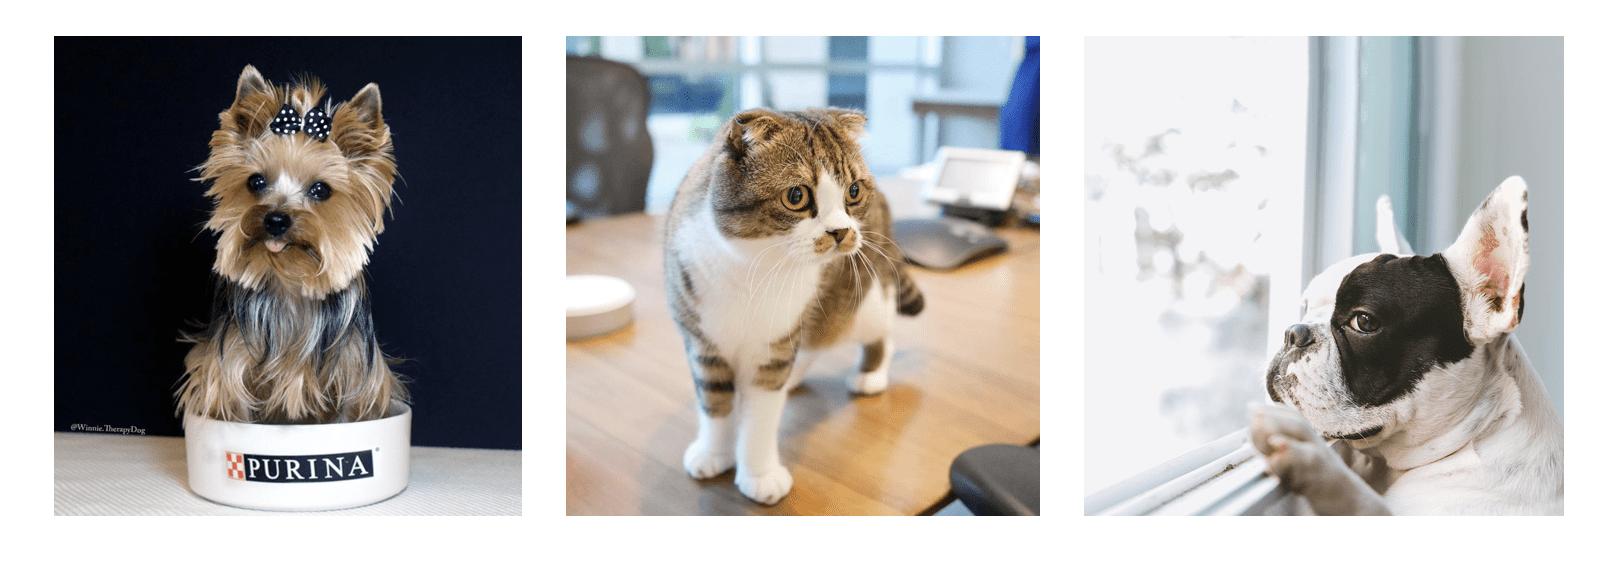 Pet Brand on Instagram, Purina